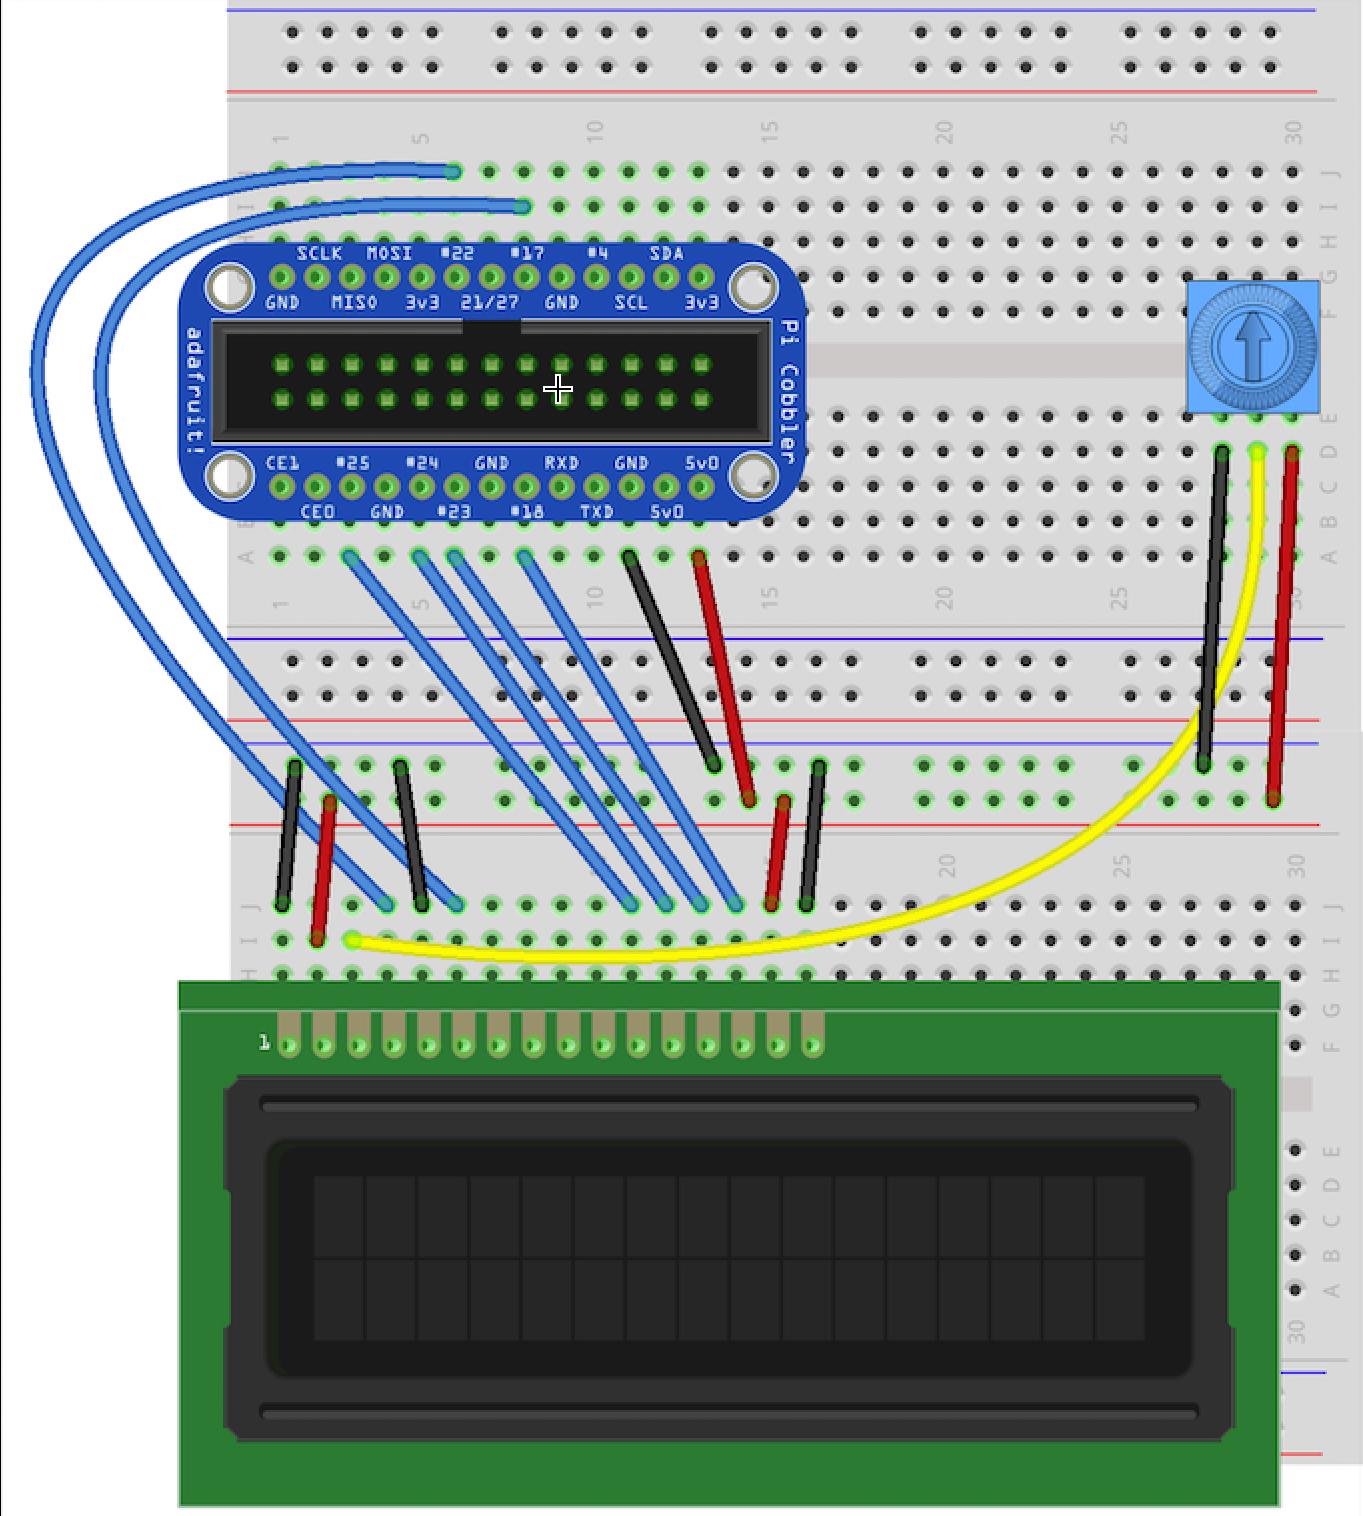 learn_raspberry_pi_2D1B4D4D-0AC7-4F0F-9A1B-01D98723C276.jpeg